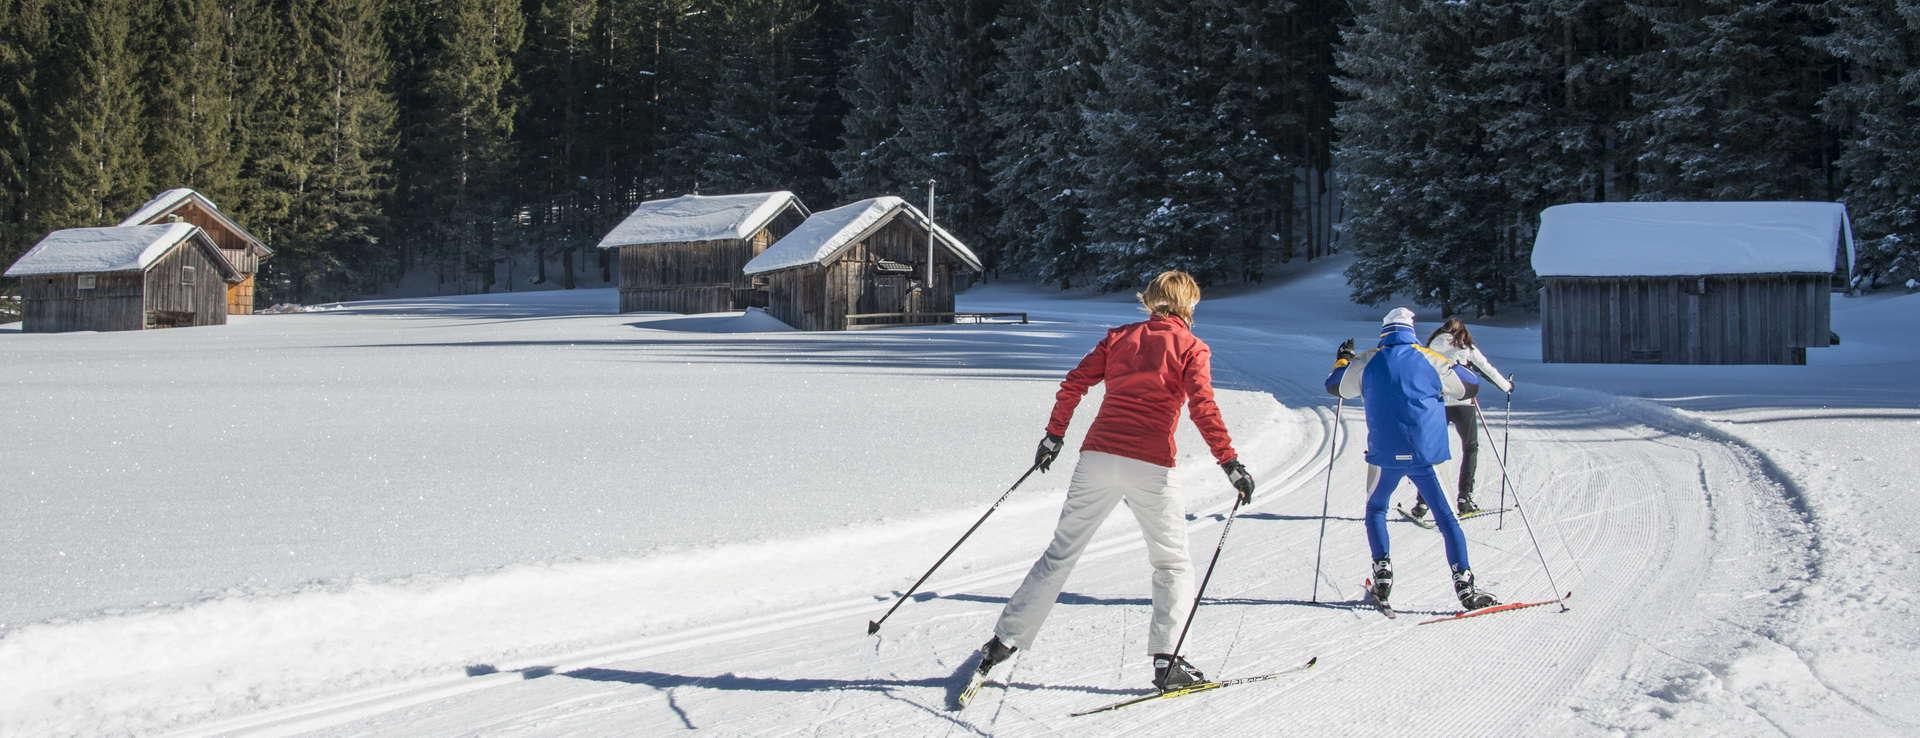 Längdåkning Blaa Alm Ausseerland berg Loser Österrike